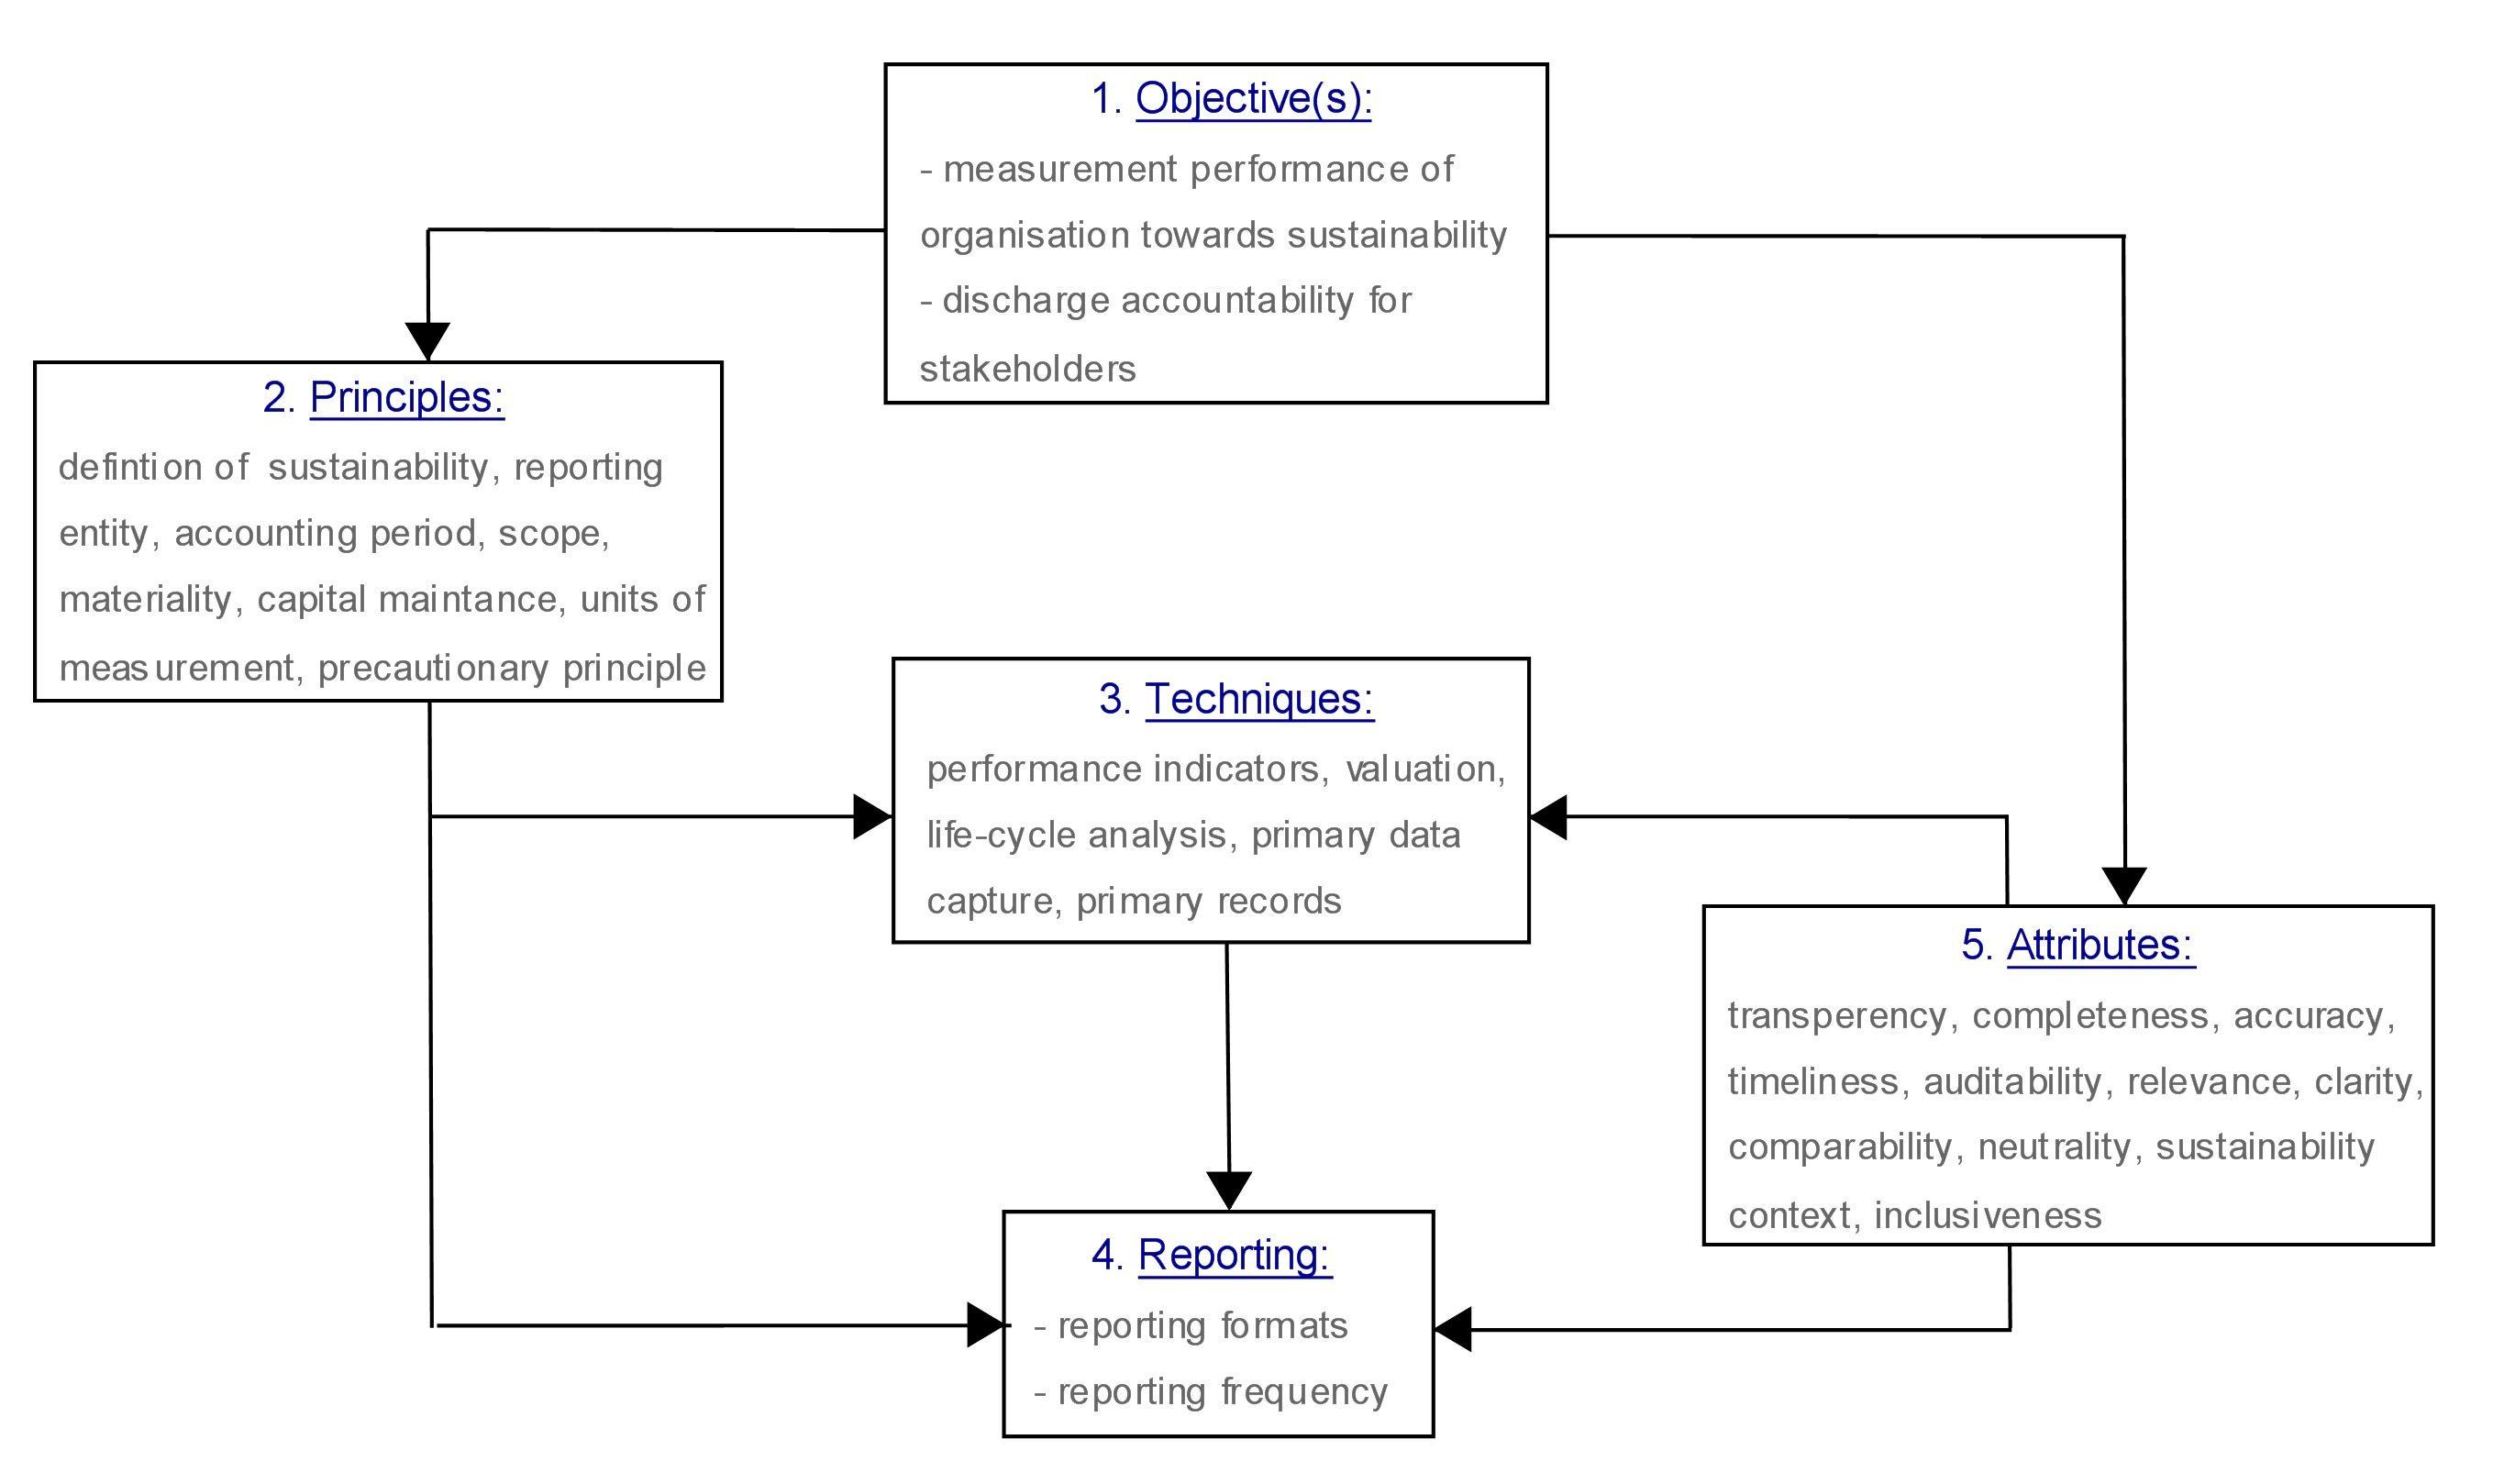 ... social reporting corporate social responsibility reporting or non